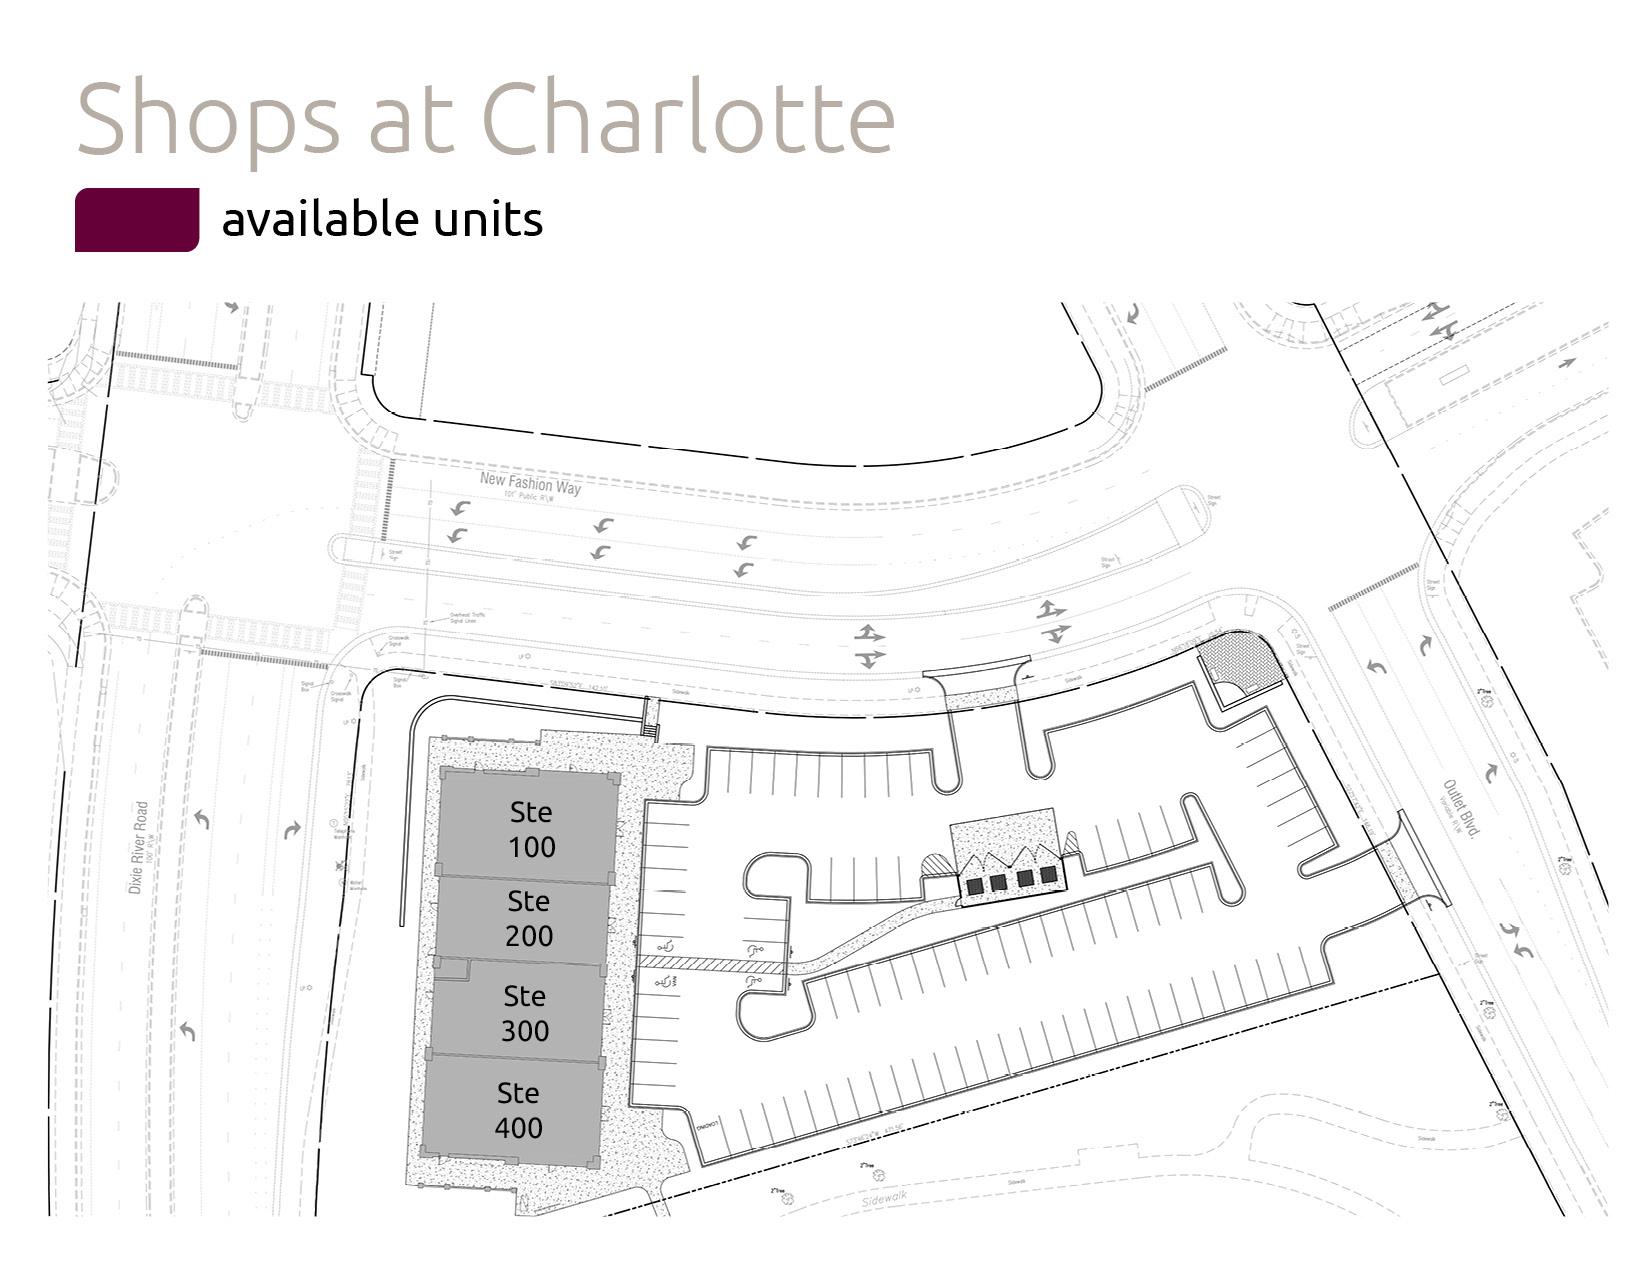 Charlotte Shops